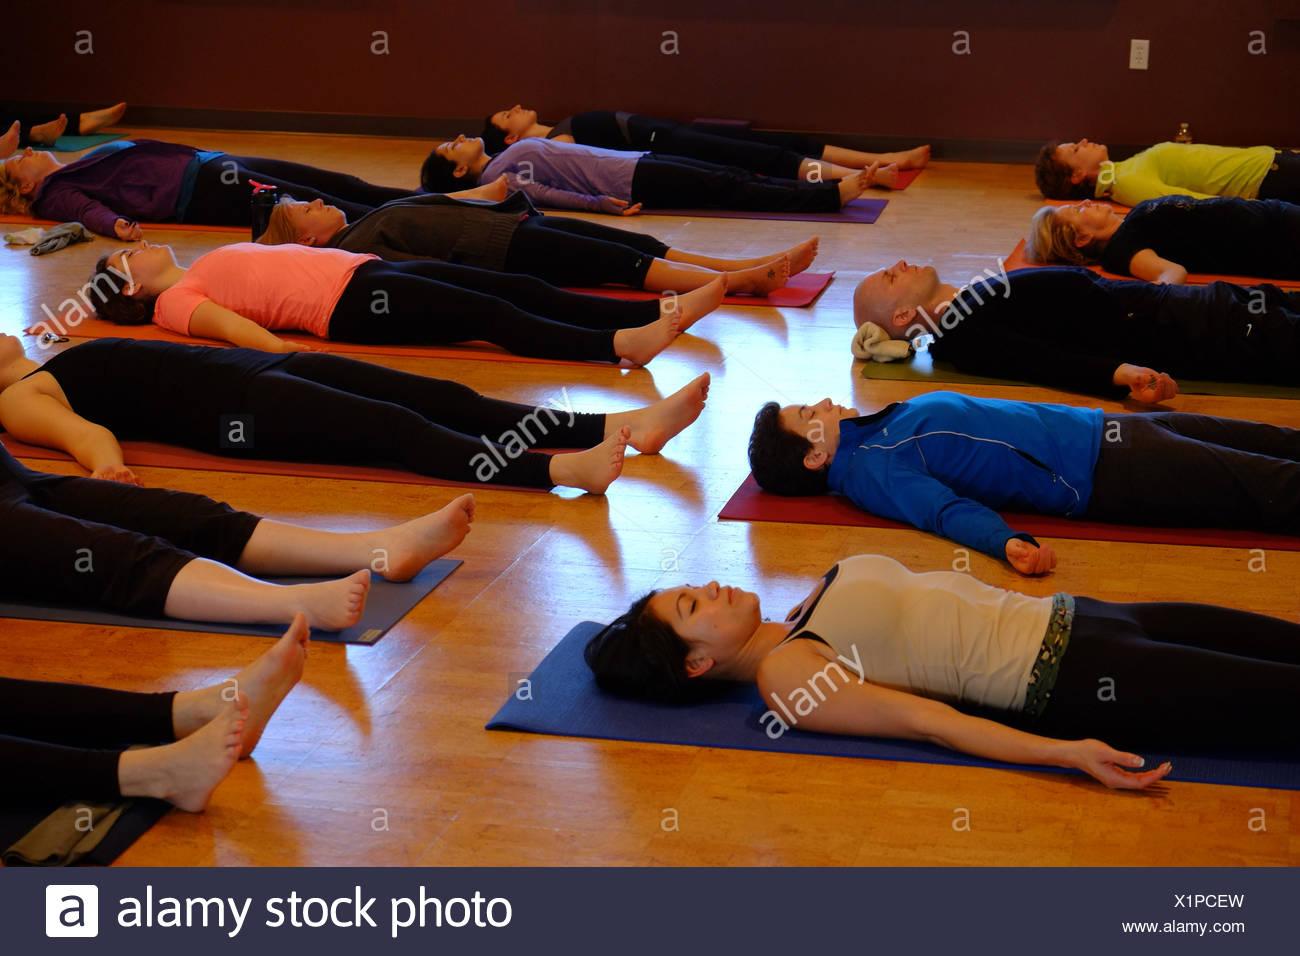 yoga students in savasana or corpse pose stock photo 276473313 alamy